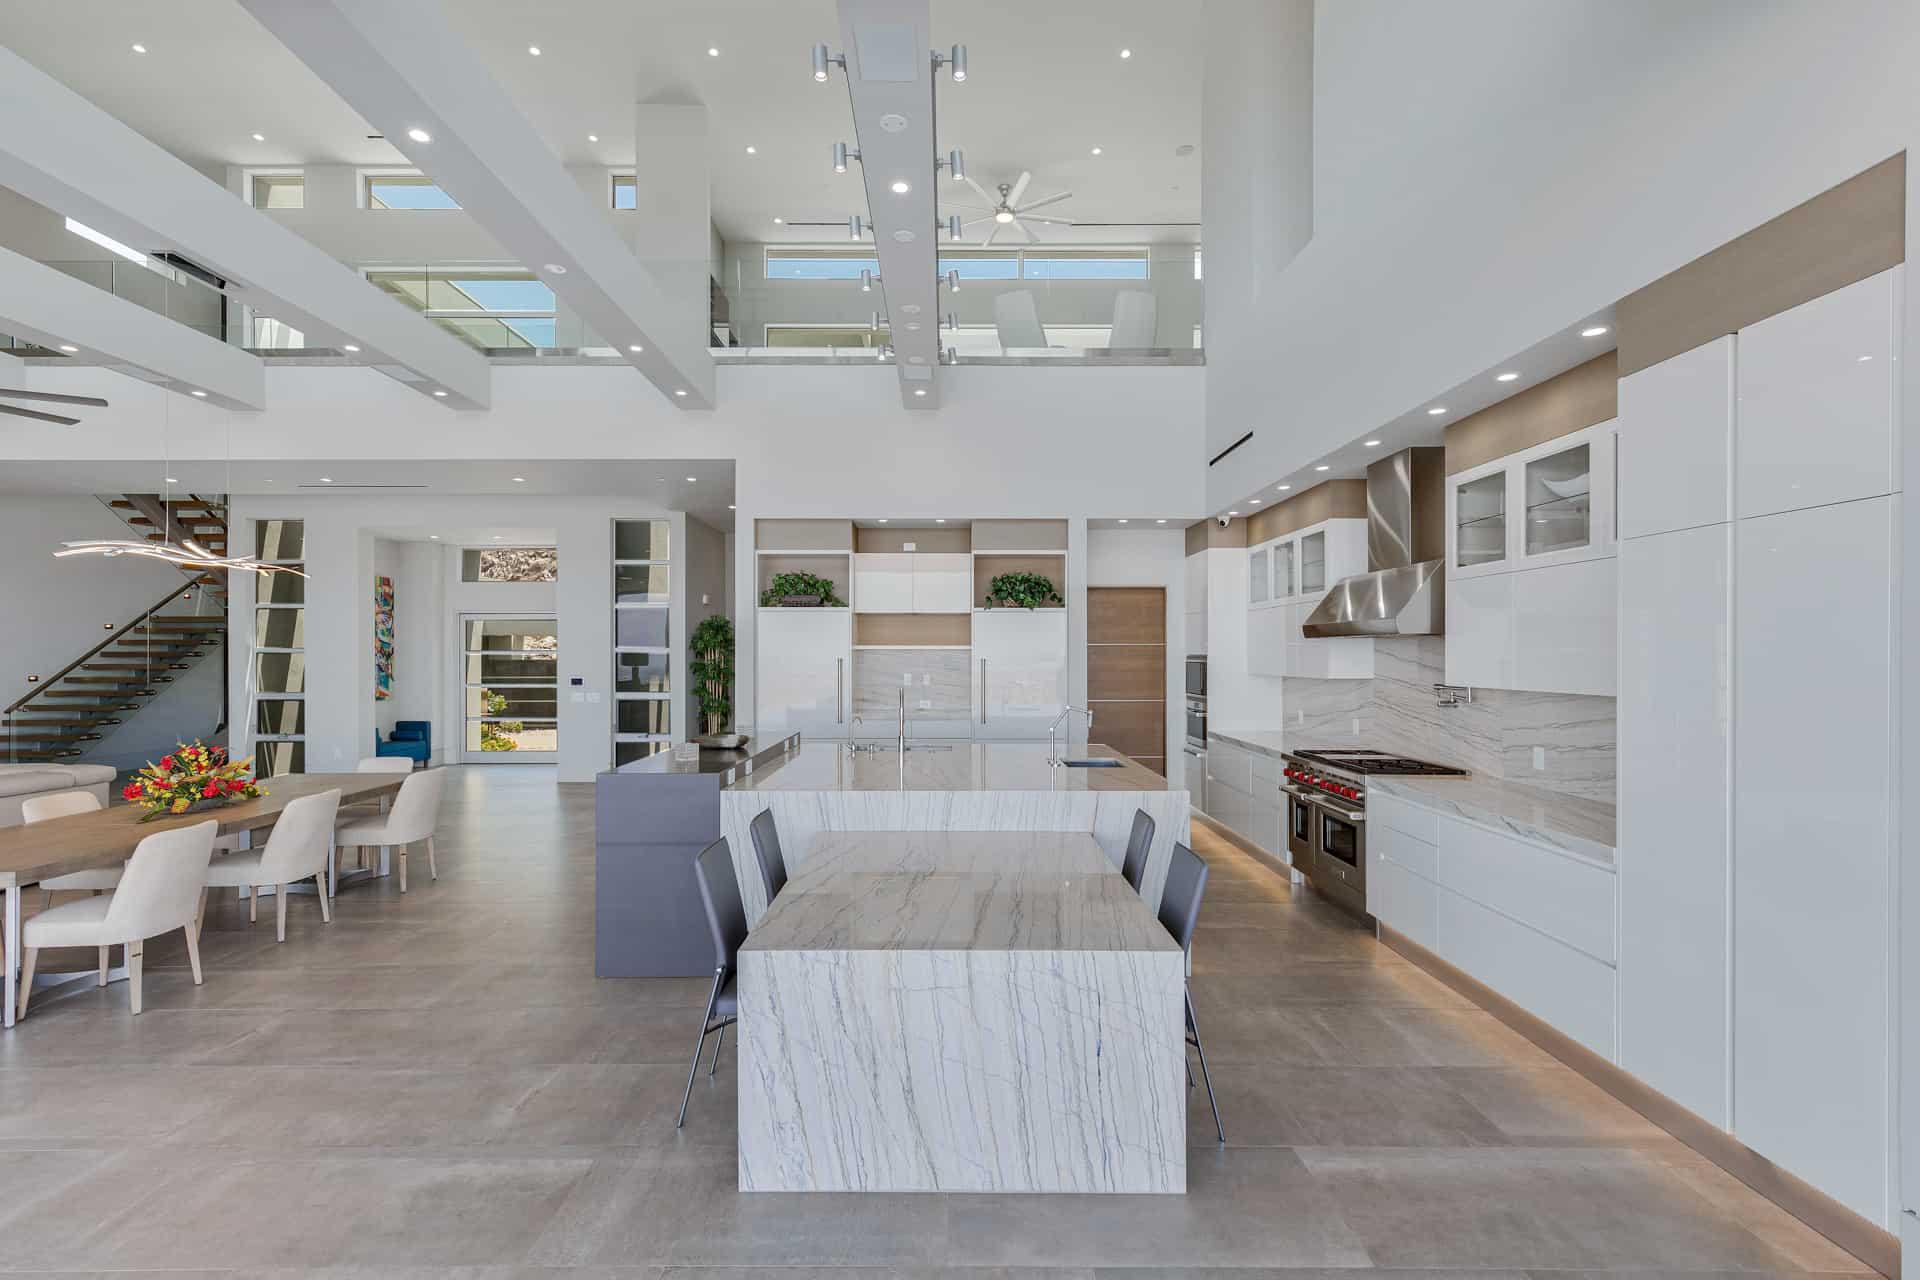 las-vegas-luxry-real-estate-realtor-rob-jensen-company-5-rockstream-drive-ascaya034